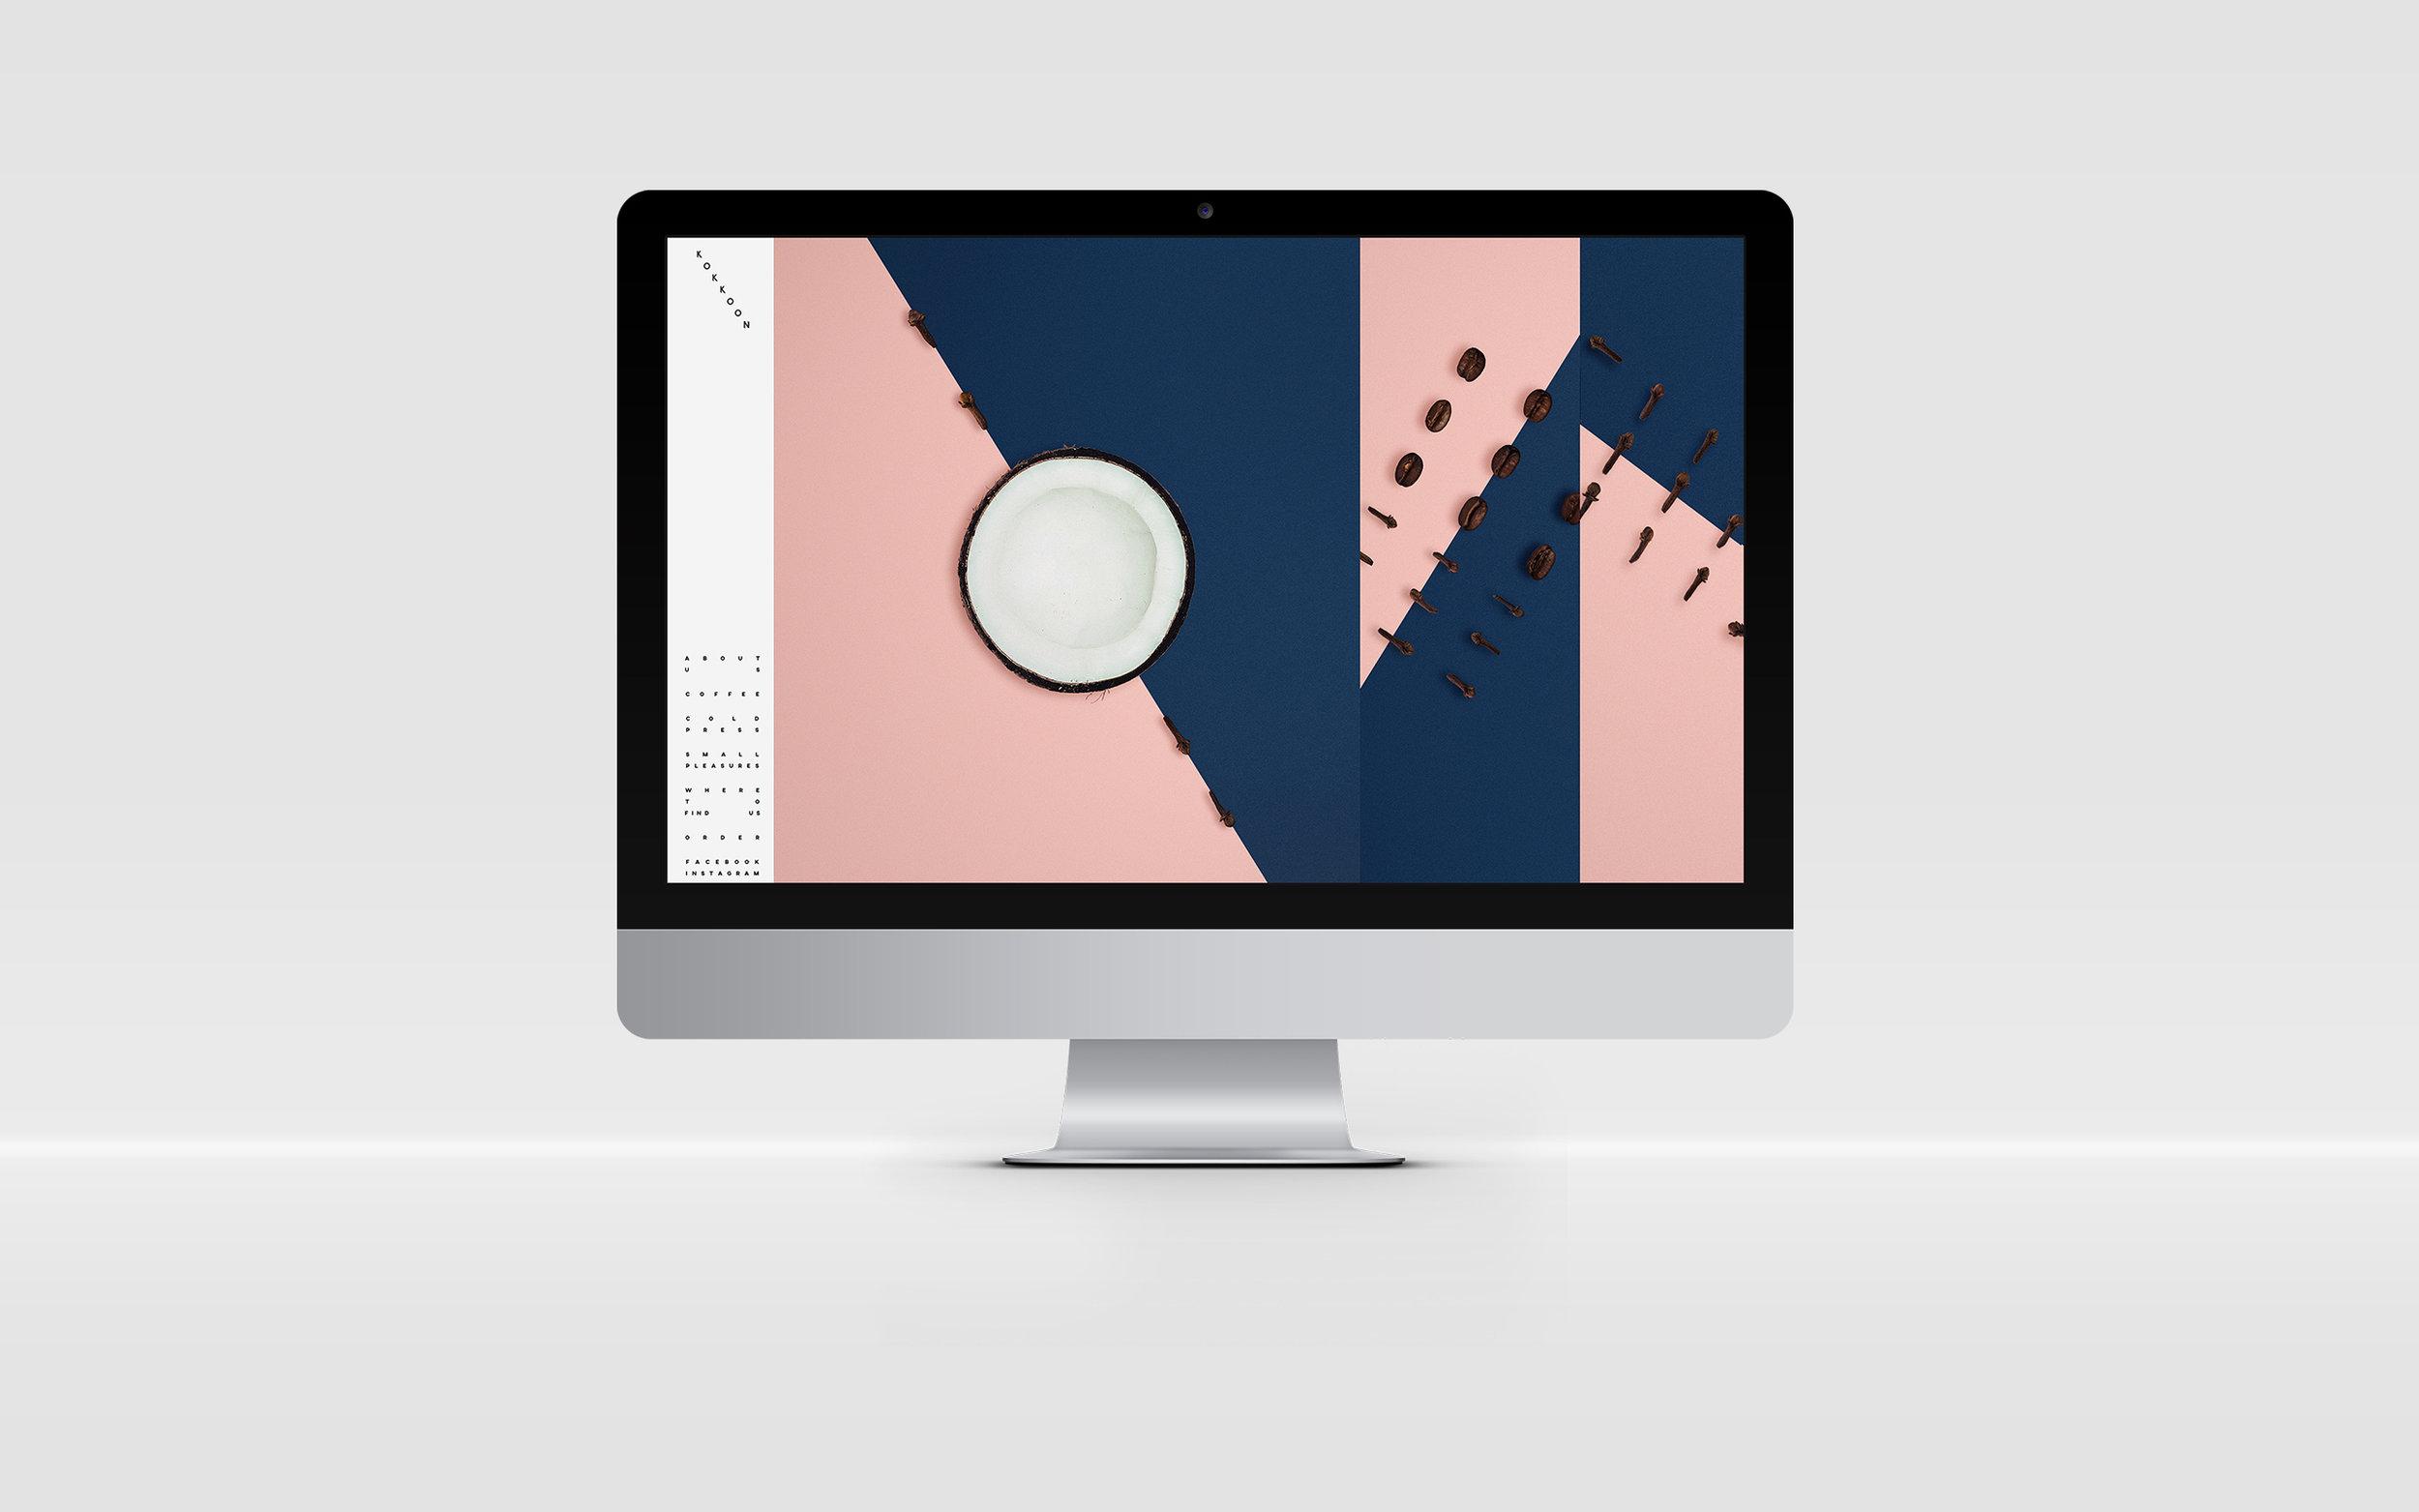 imac-Presentation-02.jpg